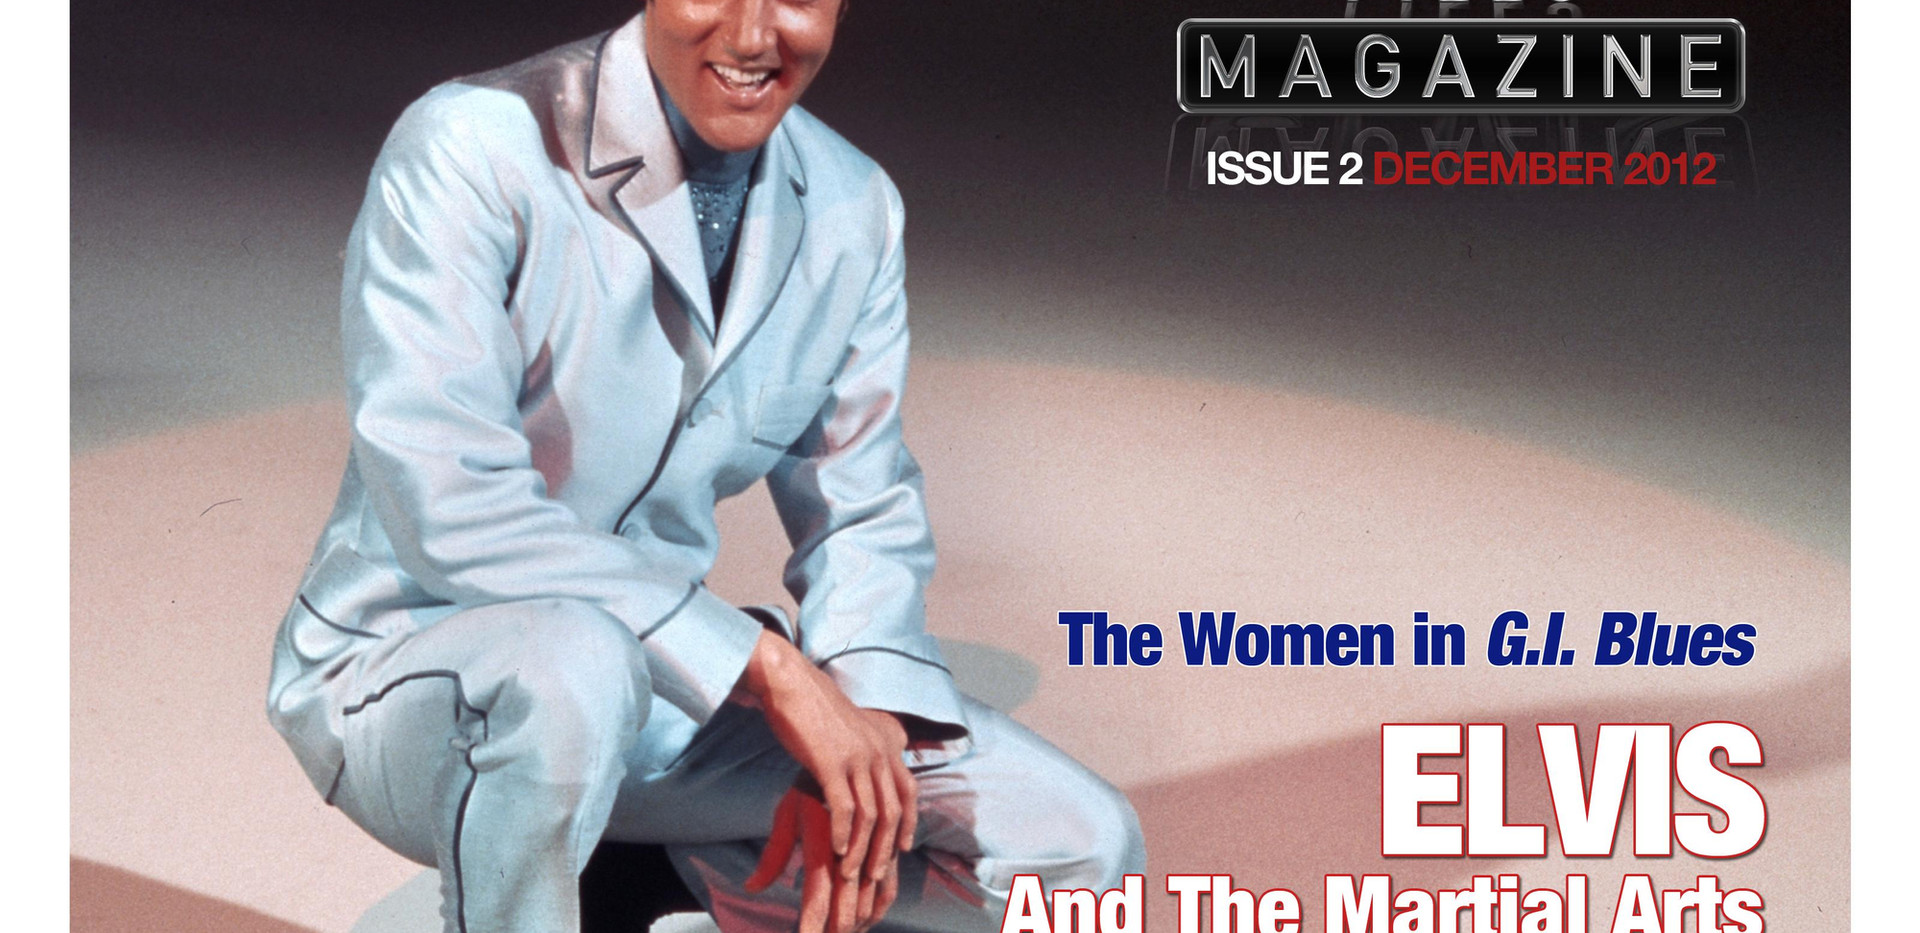 The Elvis Files magazine issue #2 (1)